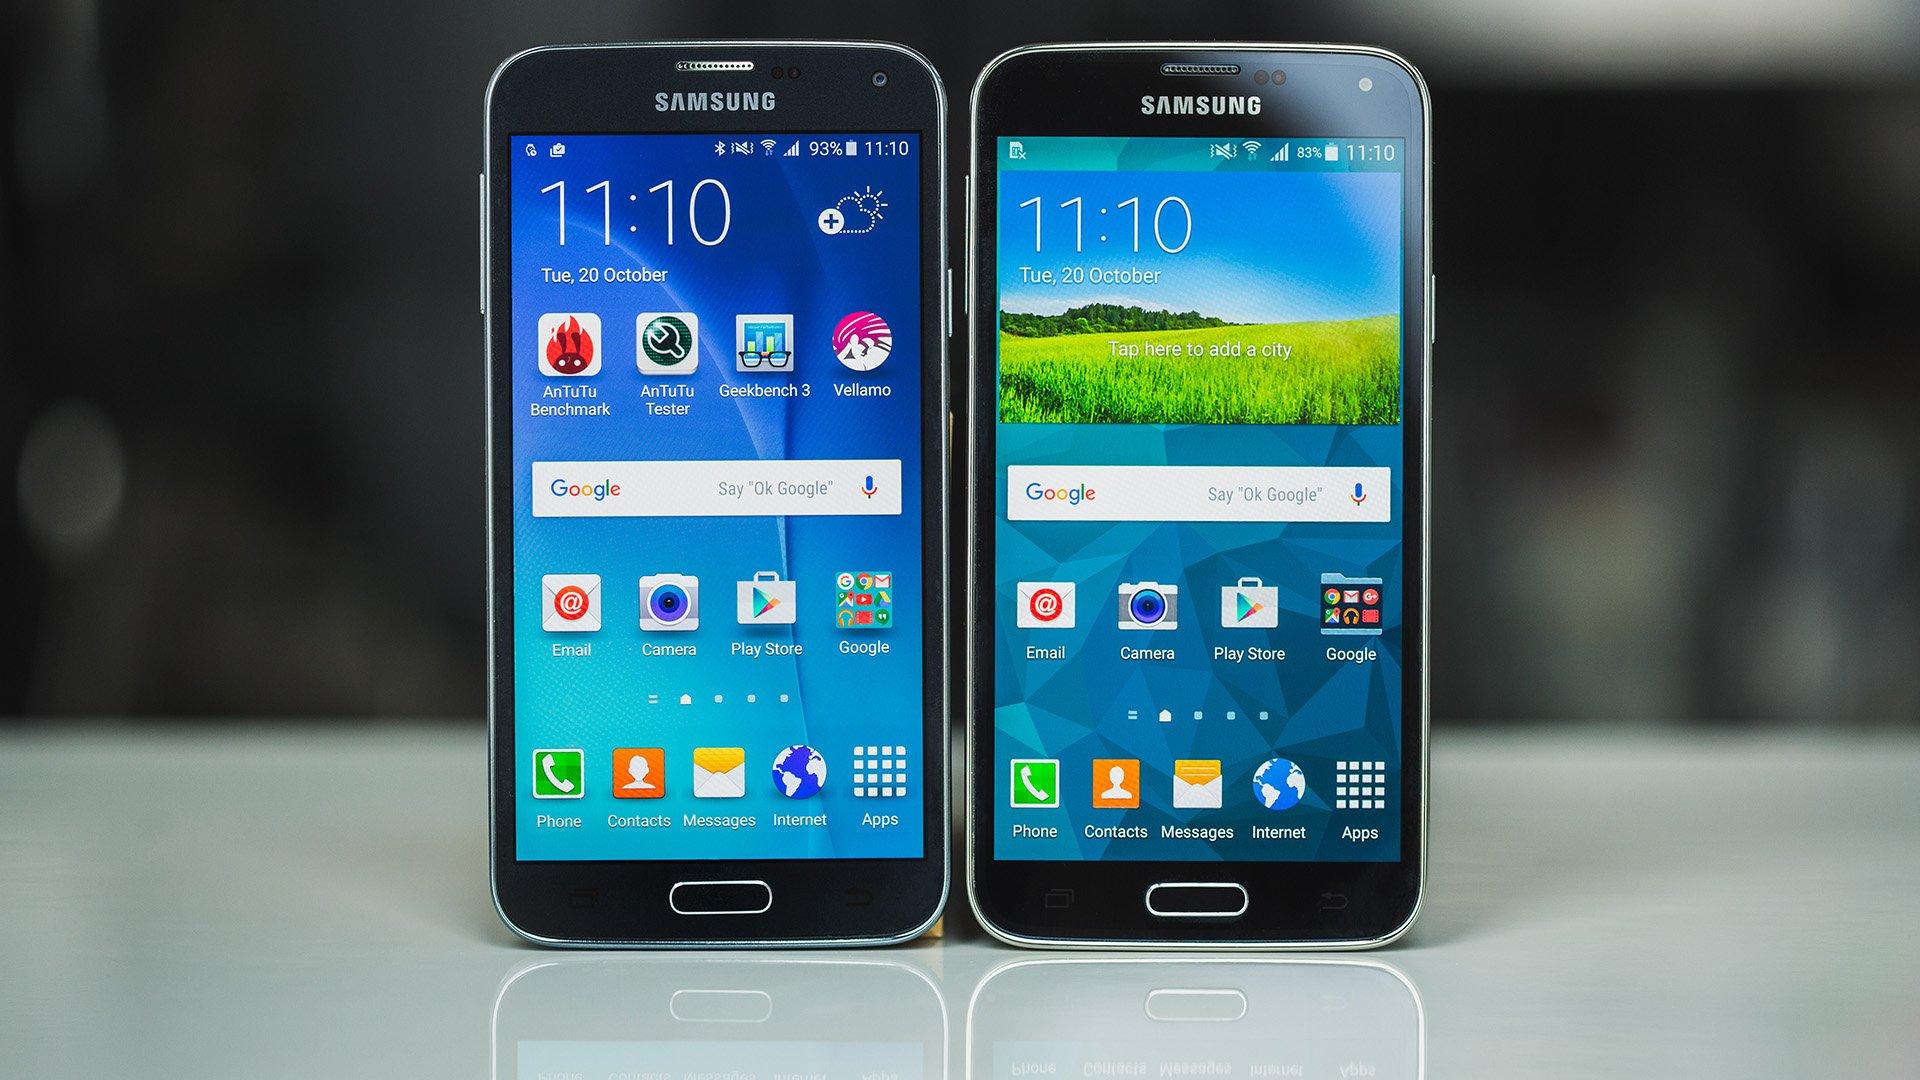 samsung galaxy s5 vs s5 neo trova le differenze androidpit. Black Bedroom Furniture Sets. Home Design Ideas